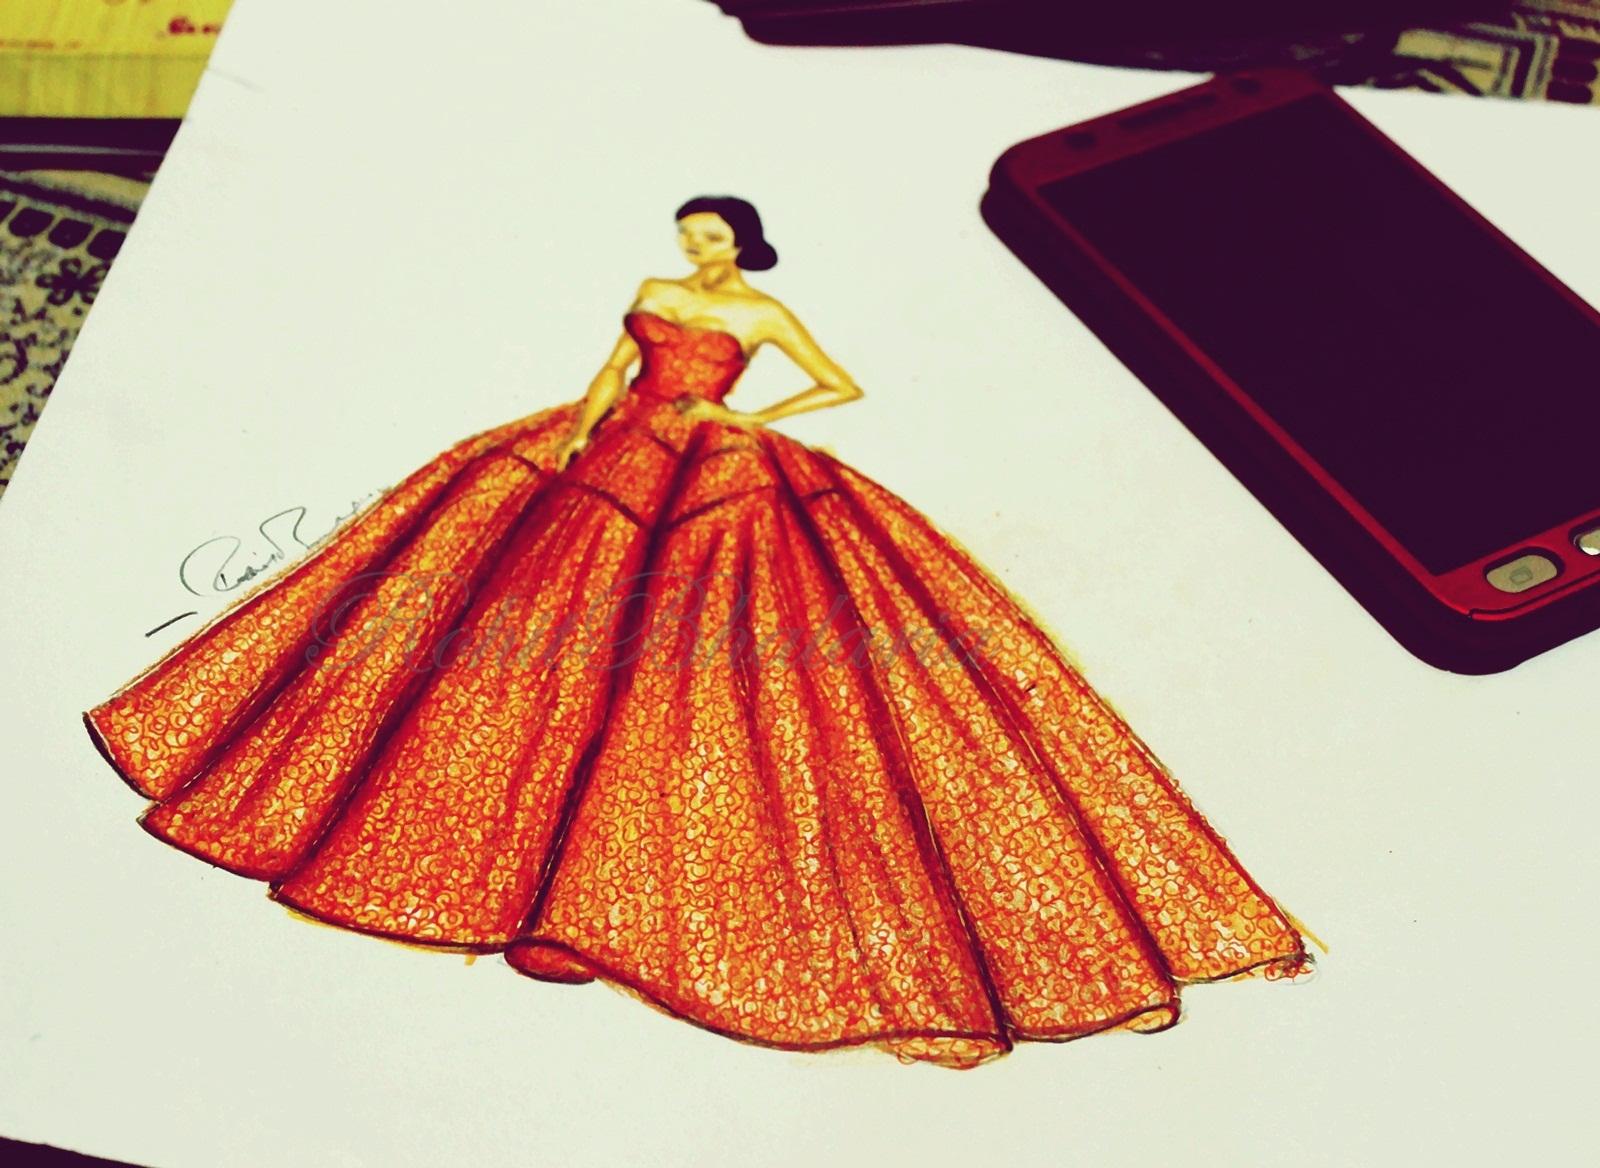 ROHIT BHALARIA: How to draw a cinderella dress